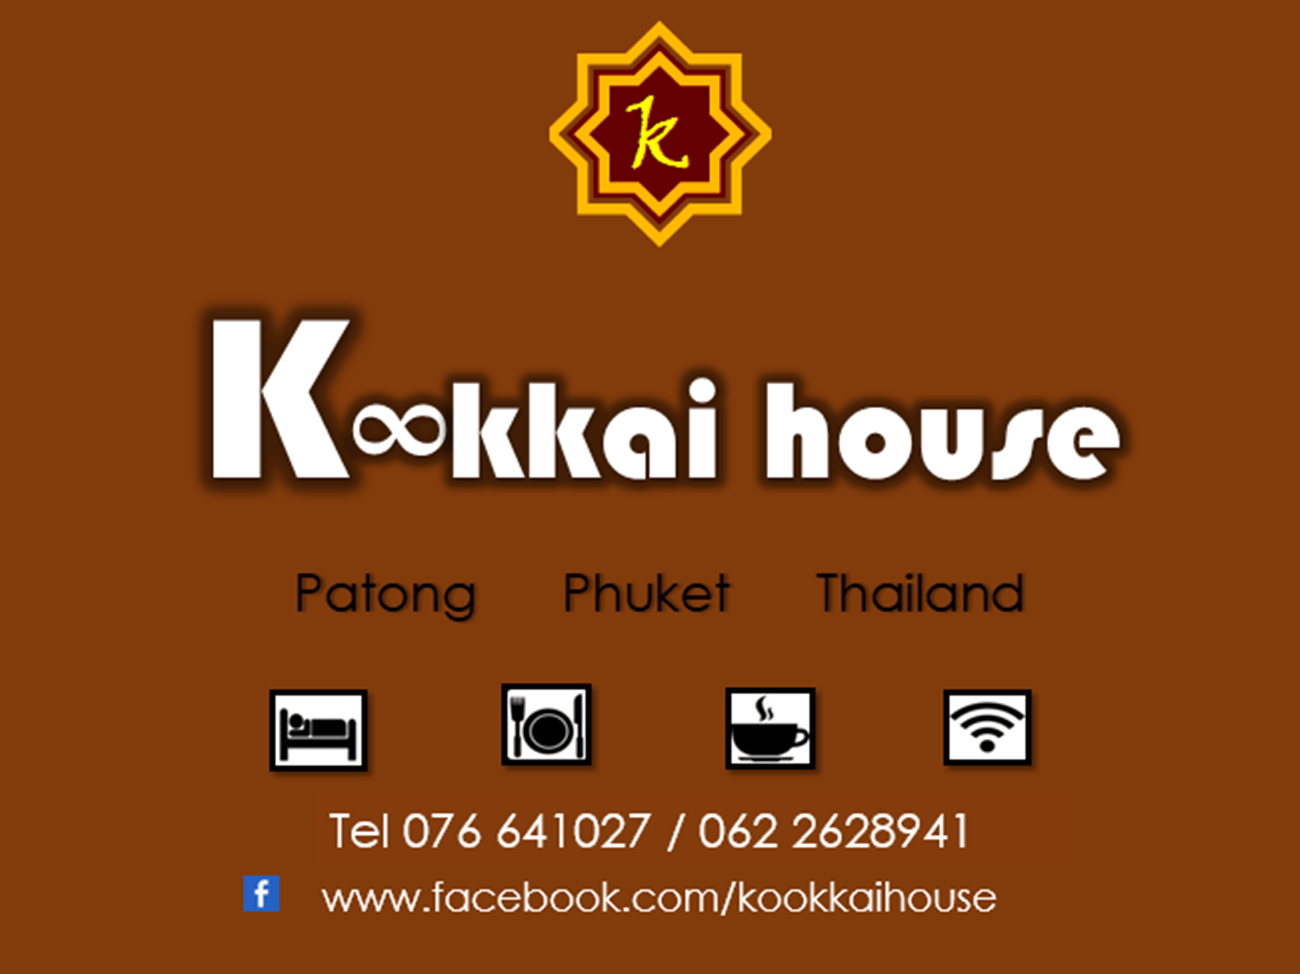 Phuket Hotels Reservation Service